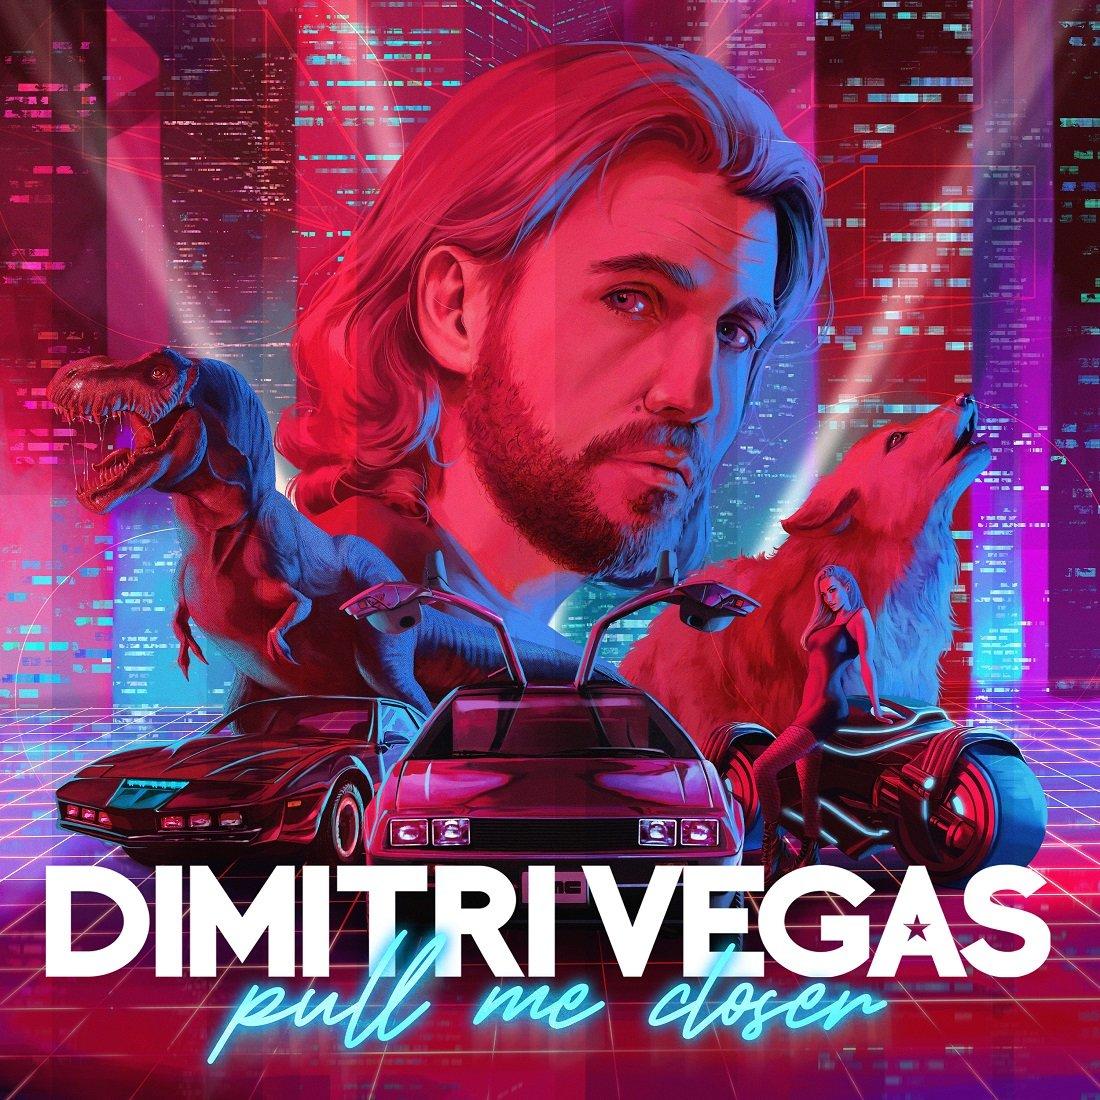 Dimitri Vegas Pull Me Closer